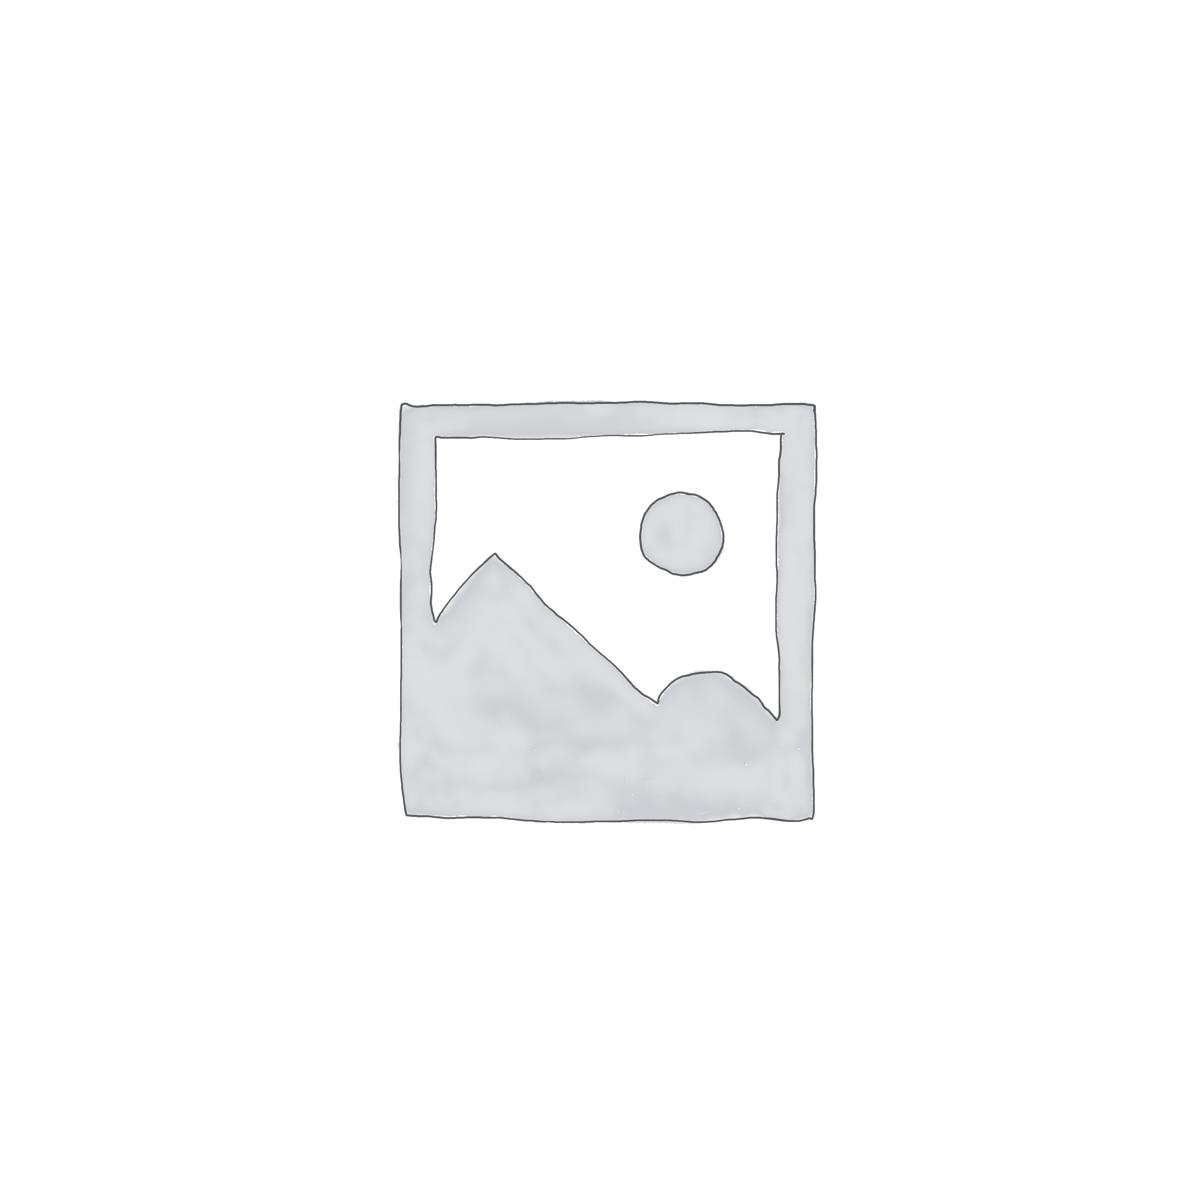 Retro Banana Leaves Pattern Wallpaper Mural